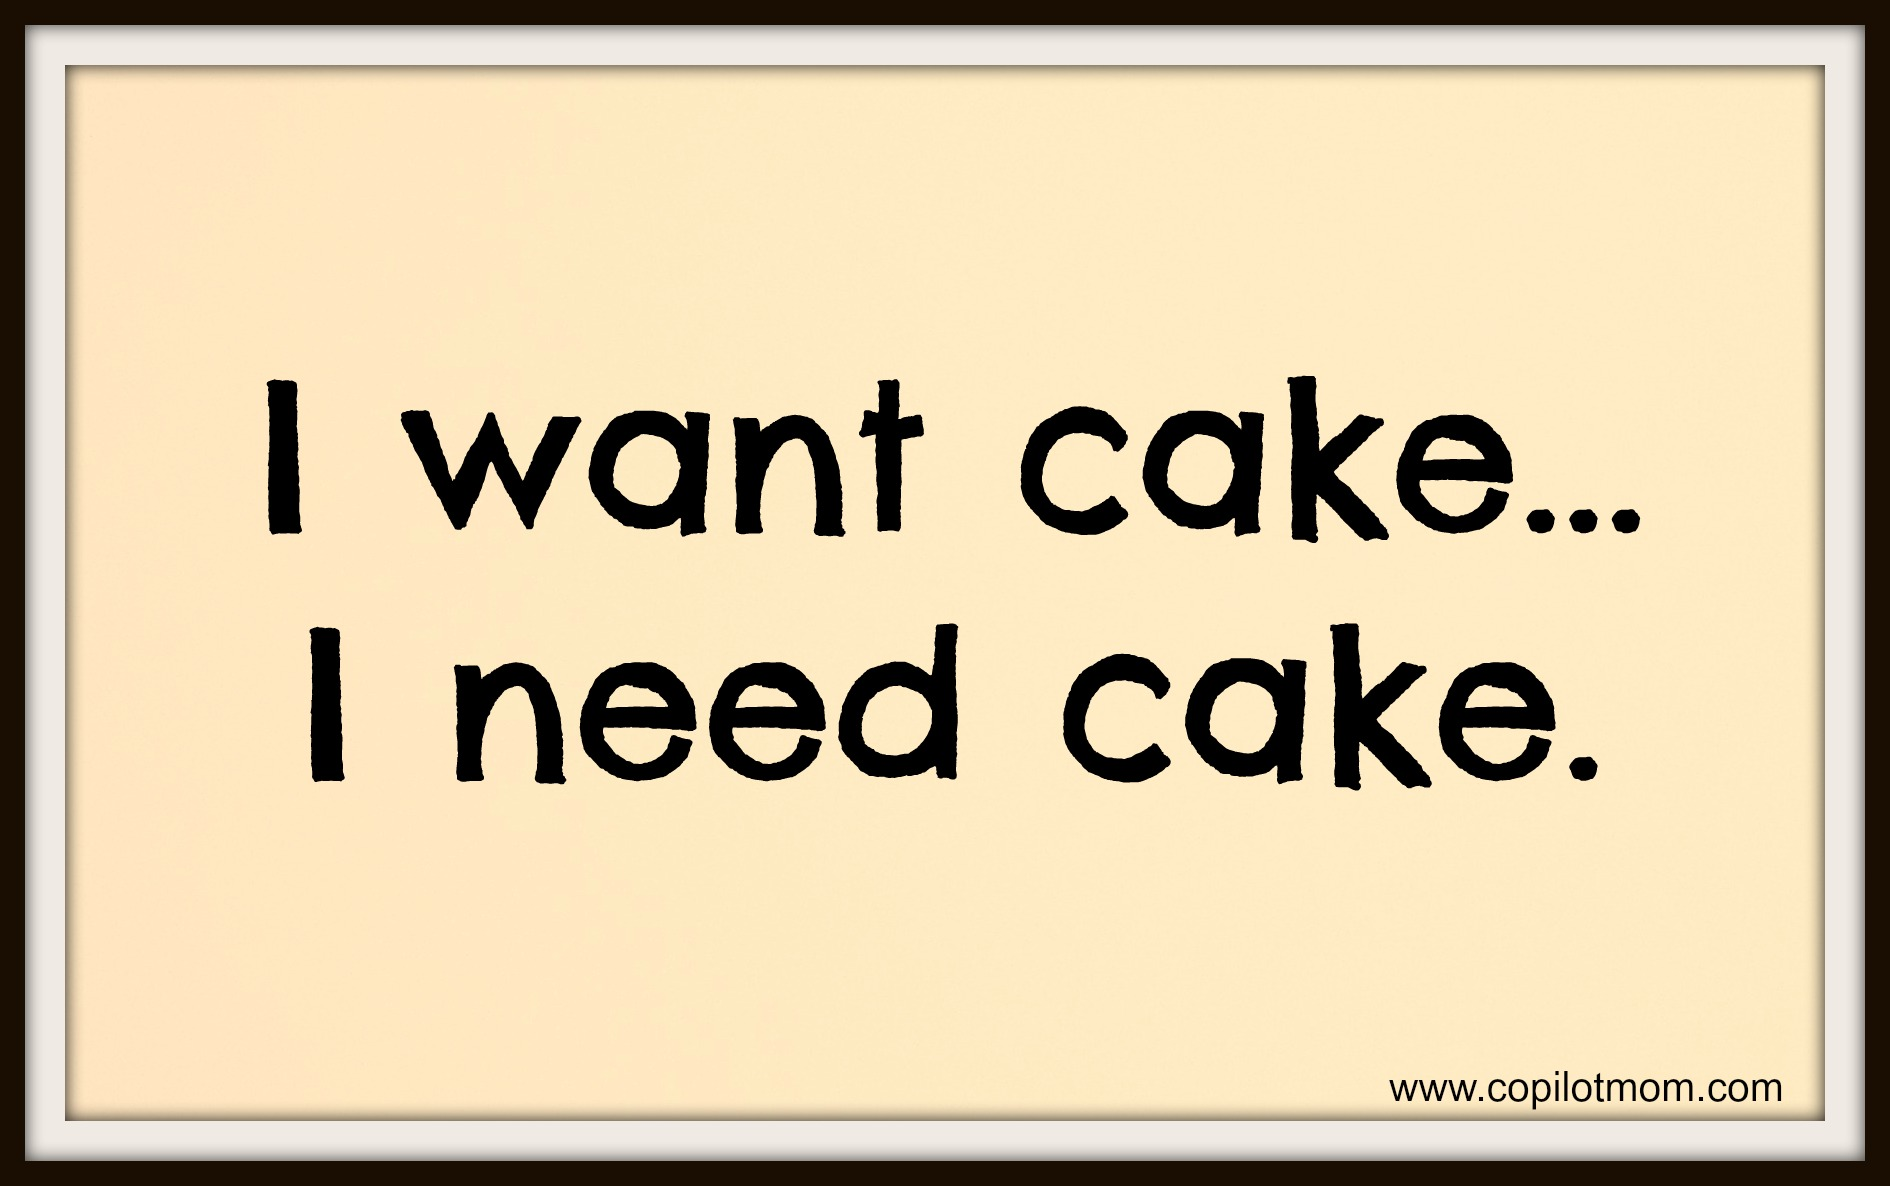 Cake quote #7